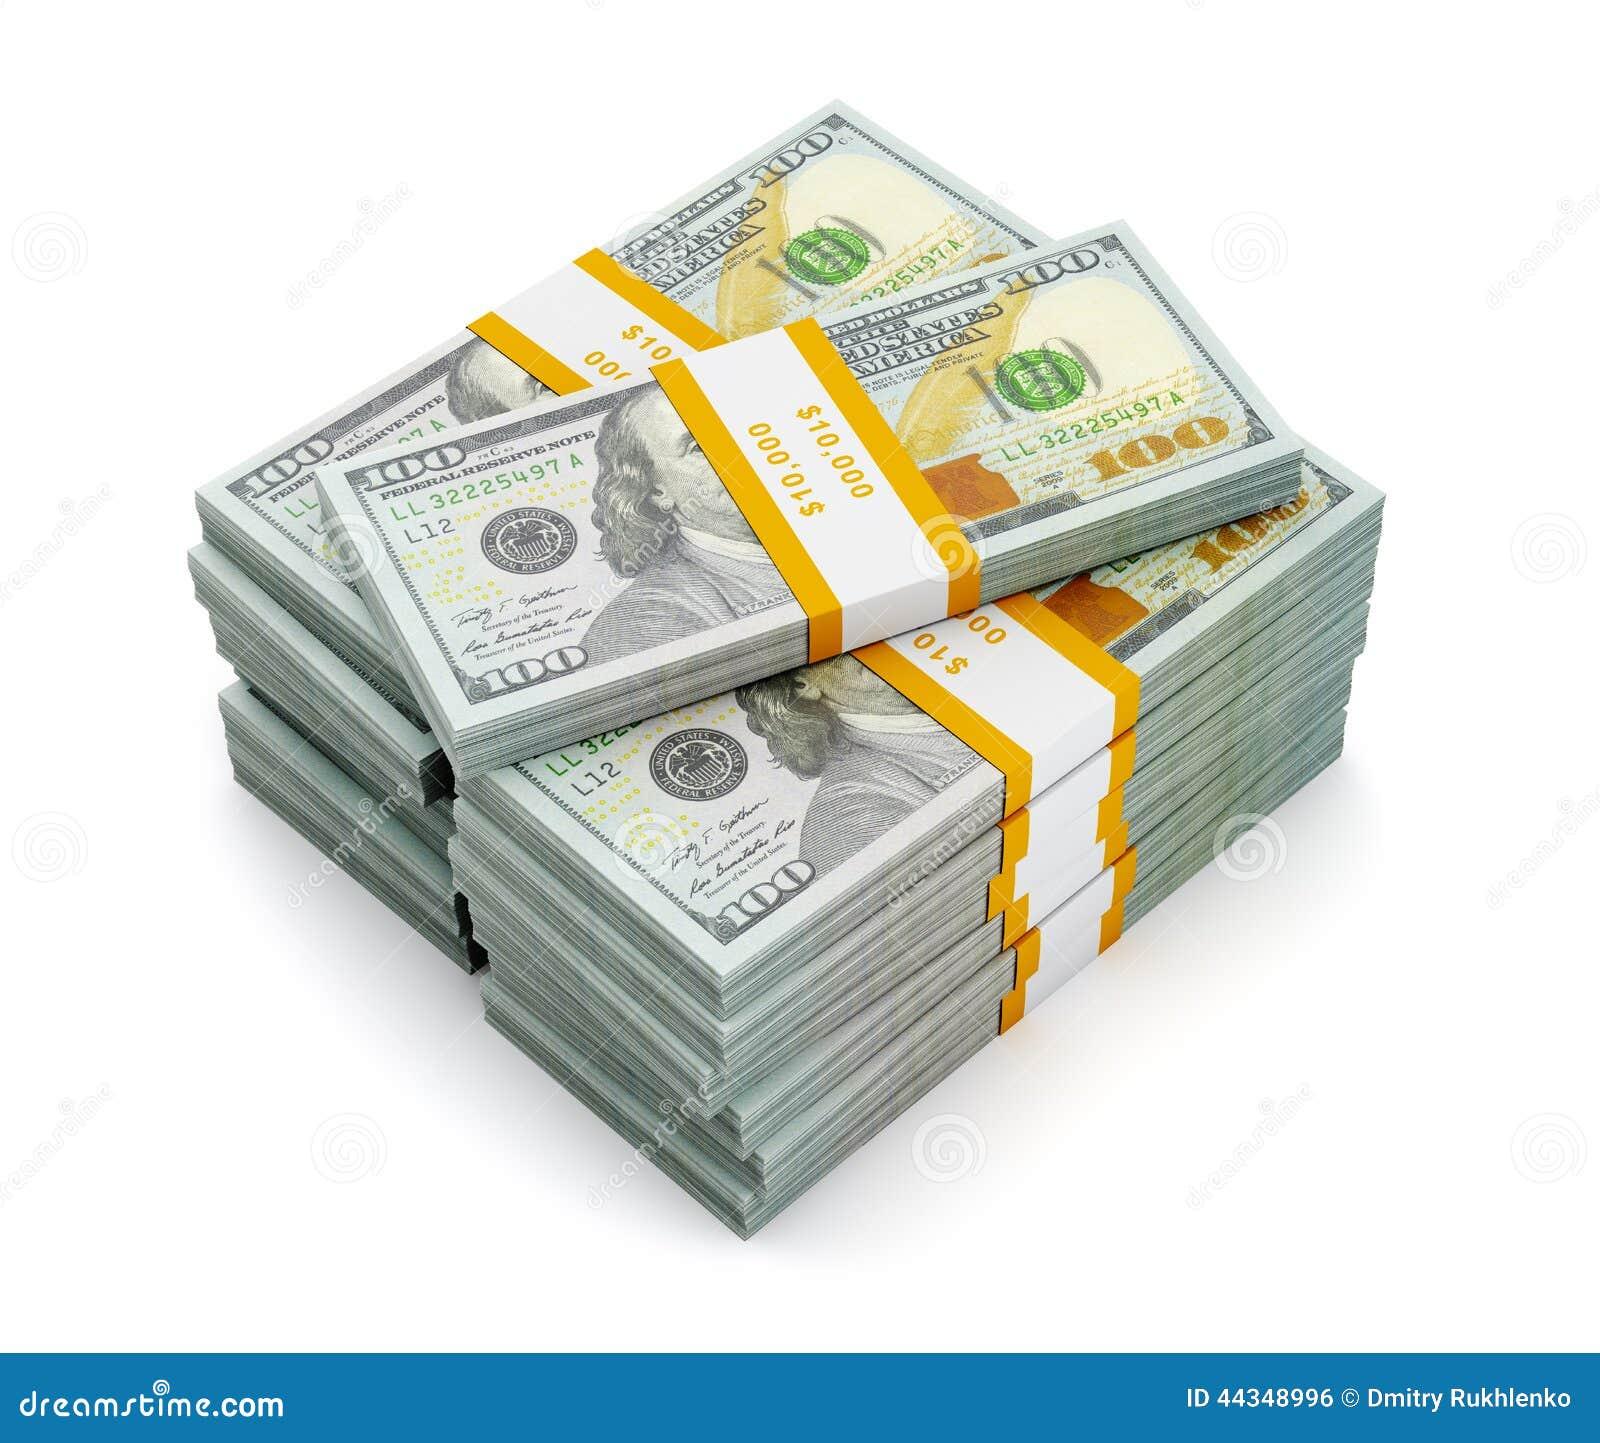 Stack Of Money 100 Dollars Bill : Stack of new us dollars edition banknotes bills